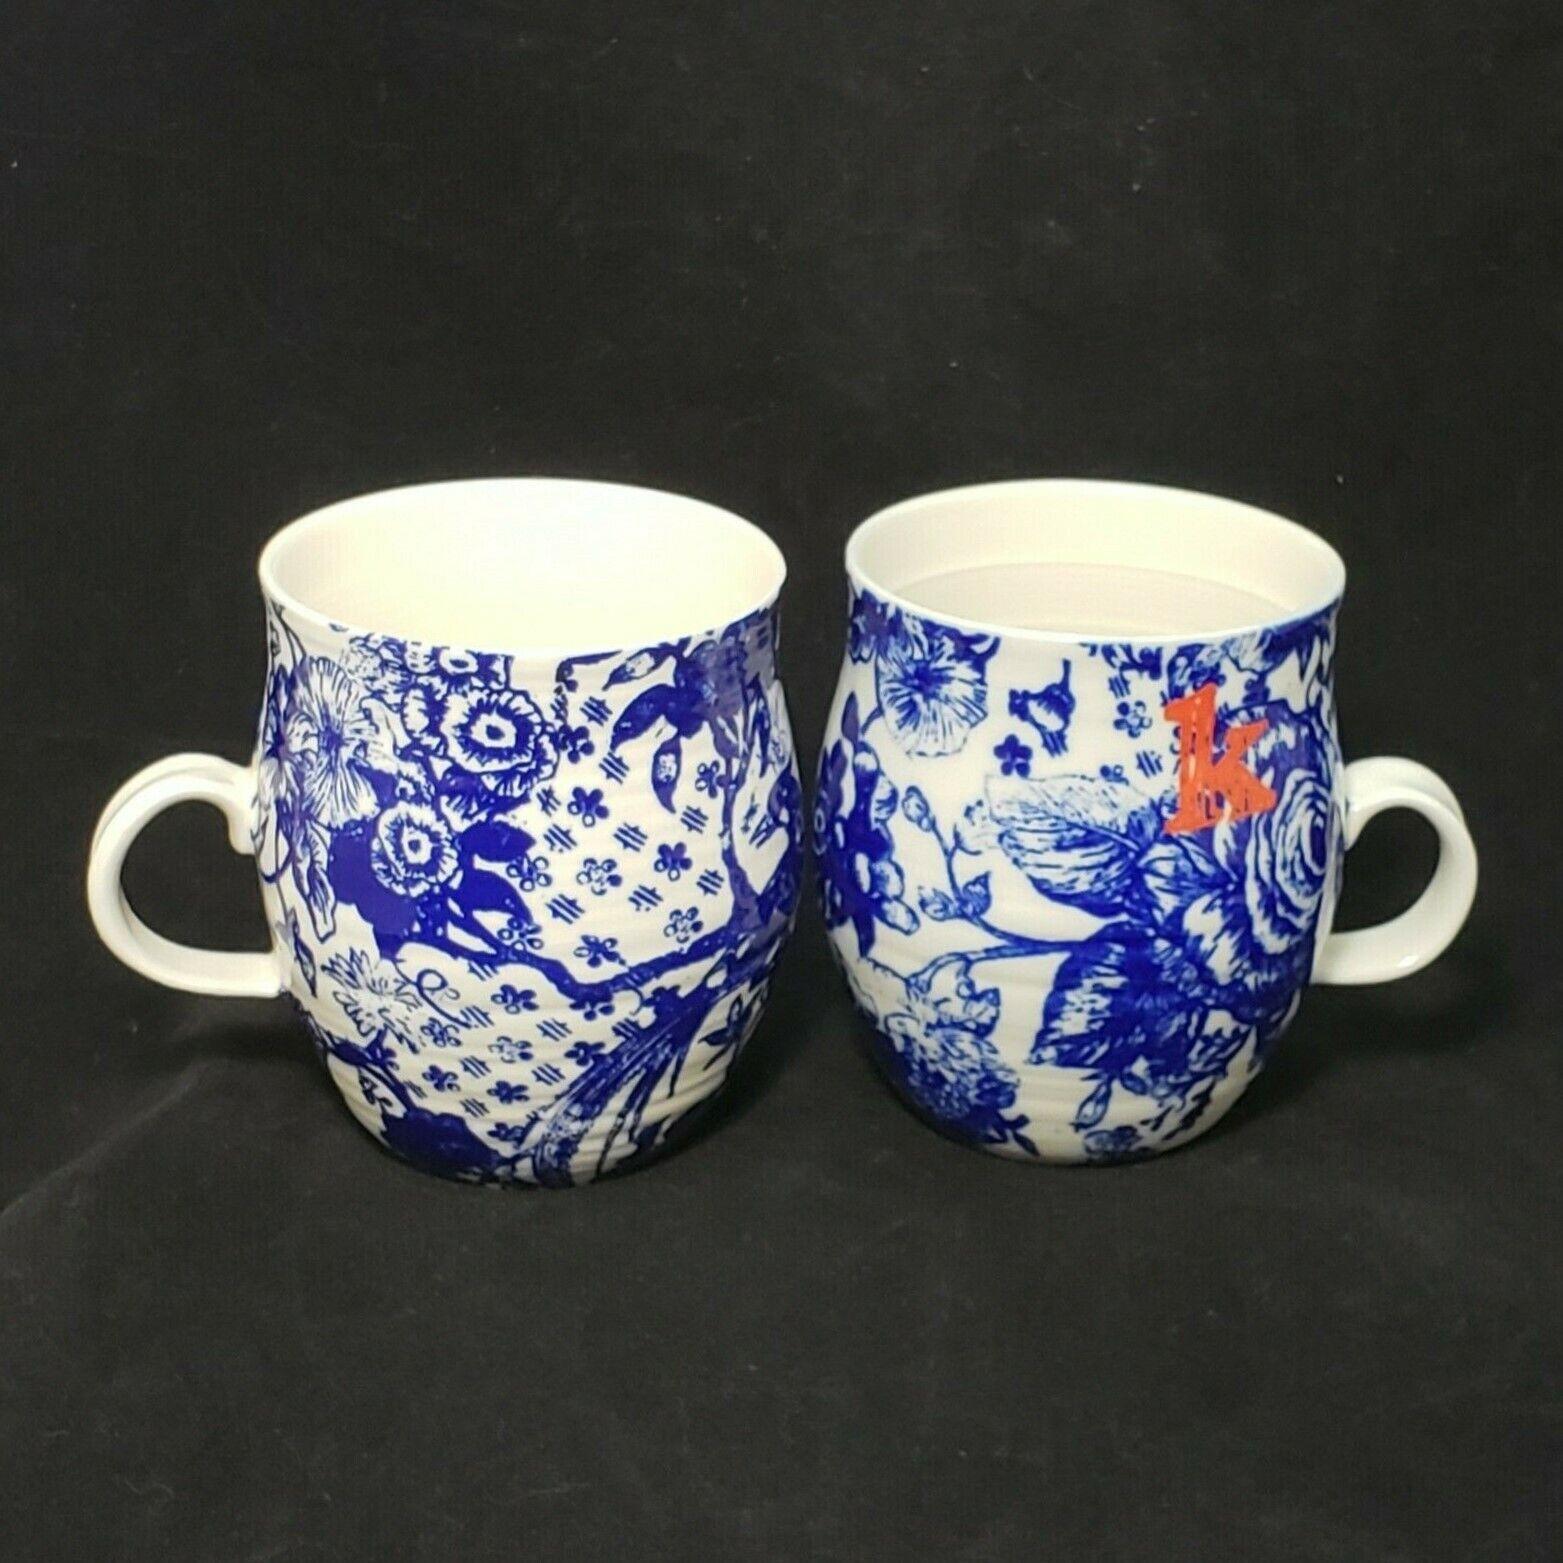 2 Anthropologie Homegrown Monogramme Lettre K Motif Floral Pétale palette Café Tasse